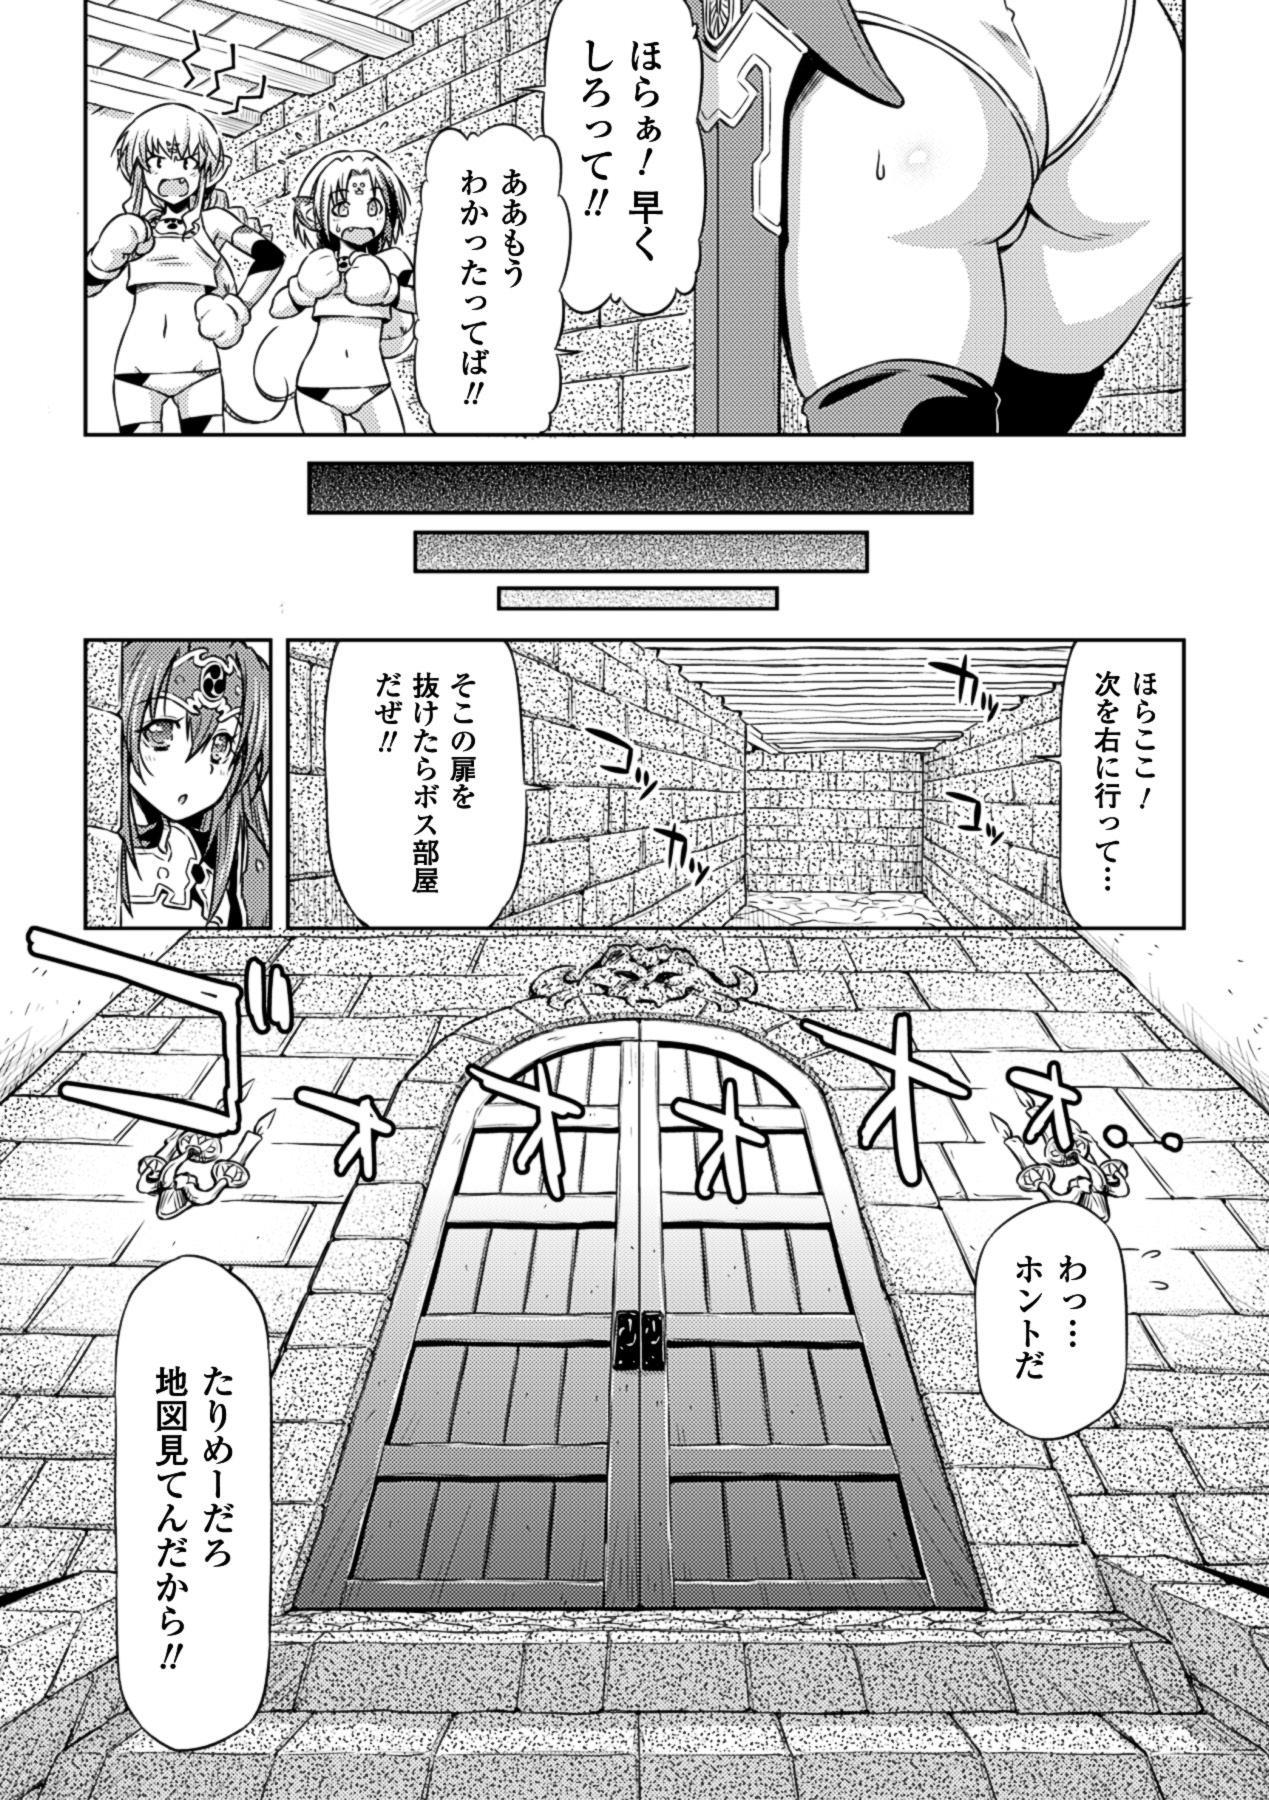 Megami Crisis 10 52